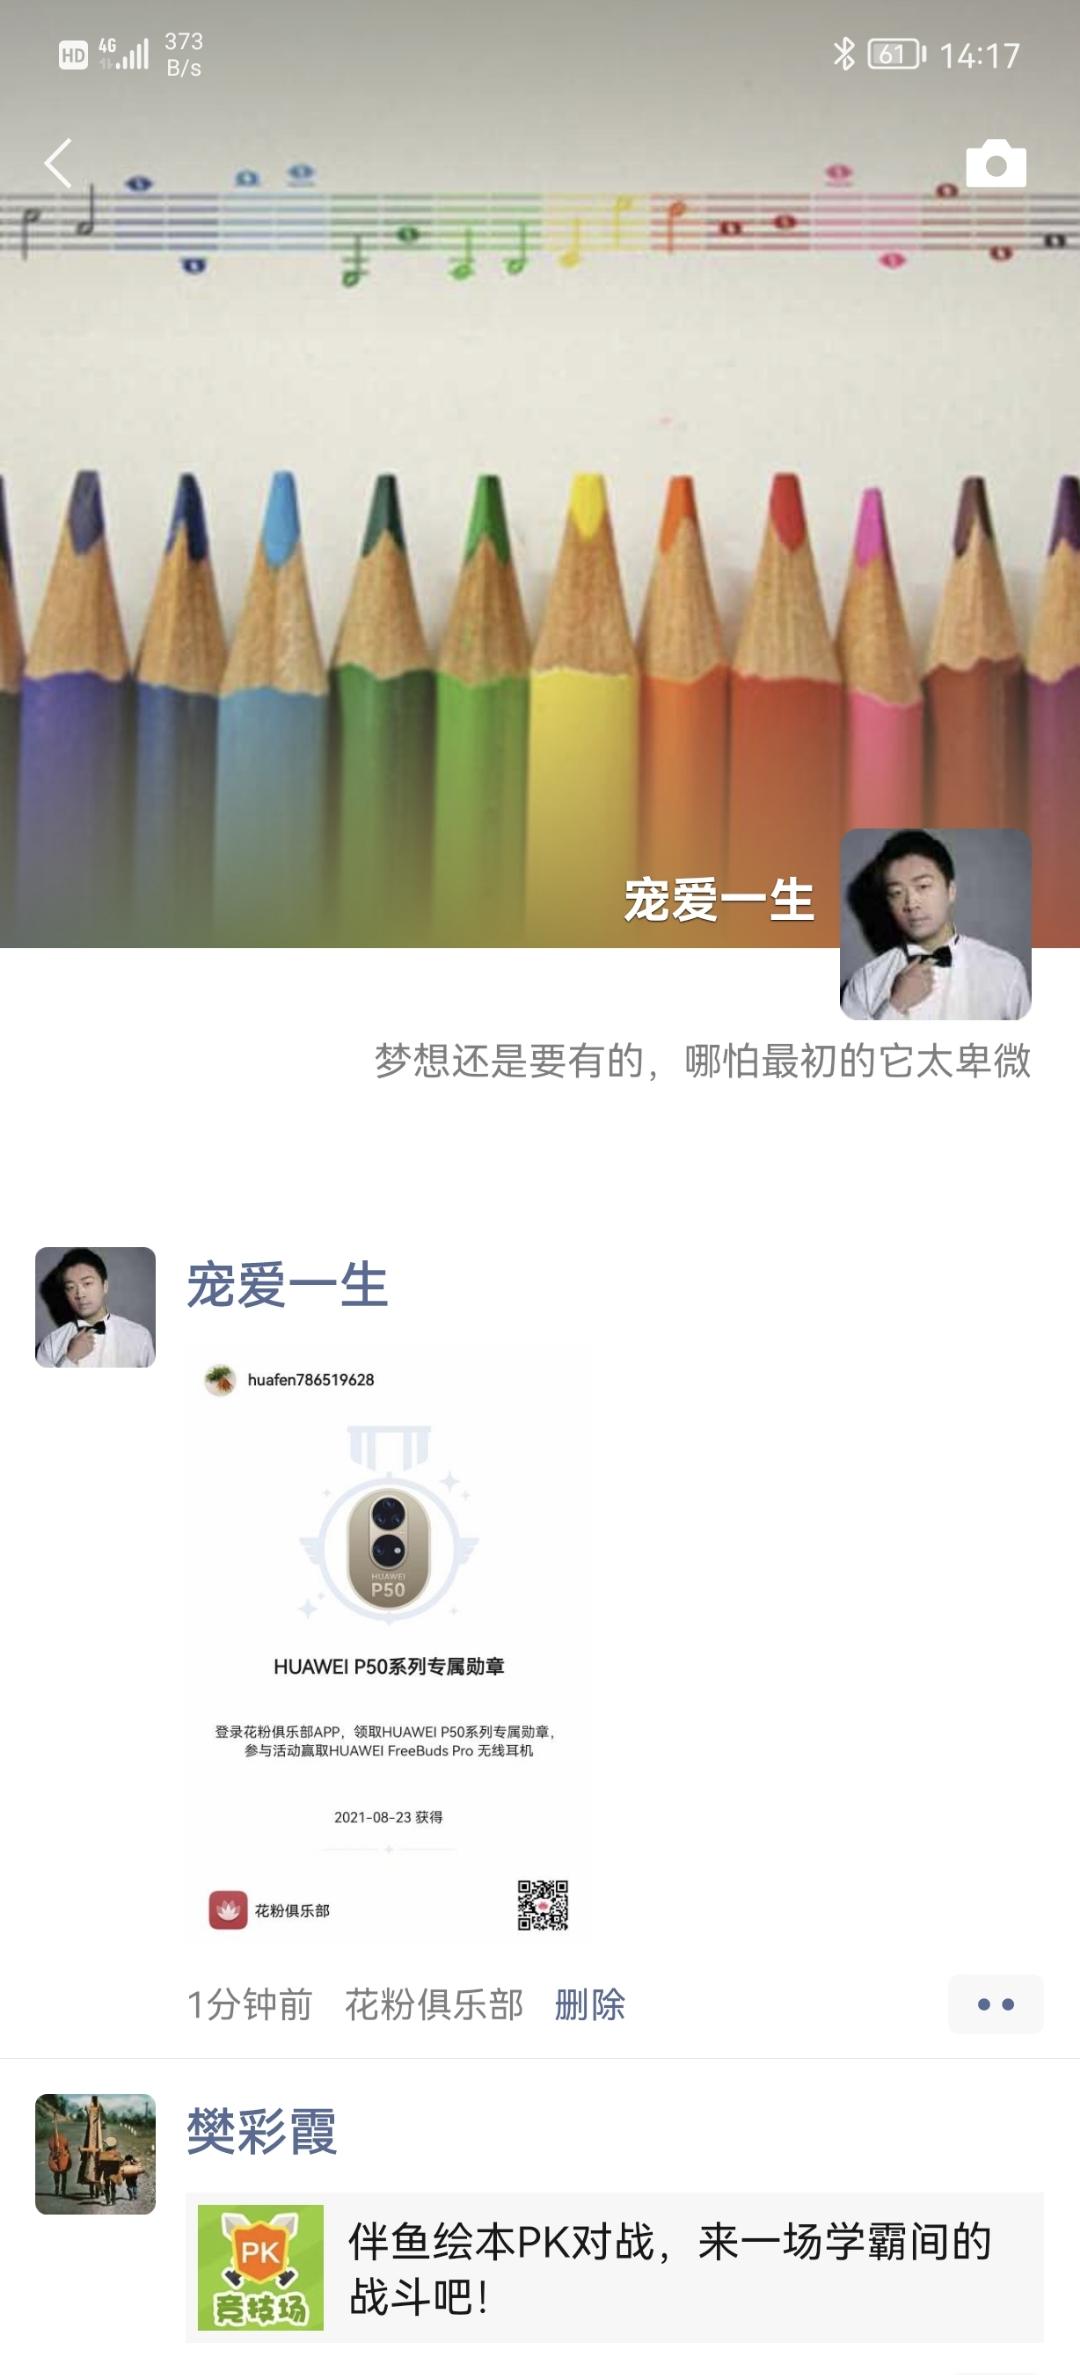 Screenshot_20210823_141707_com.tencent.mm.jpg